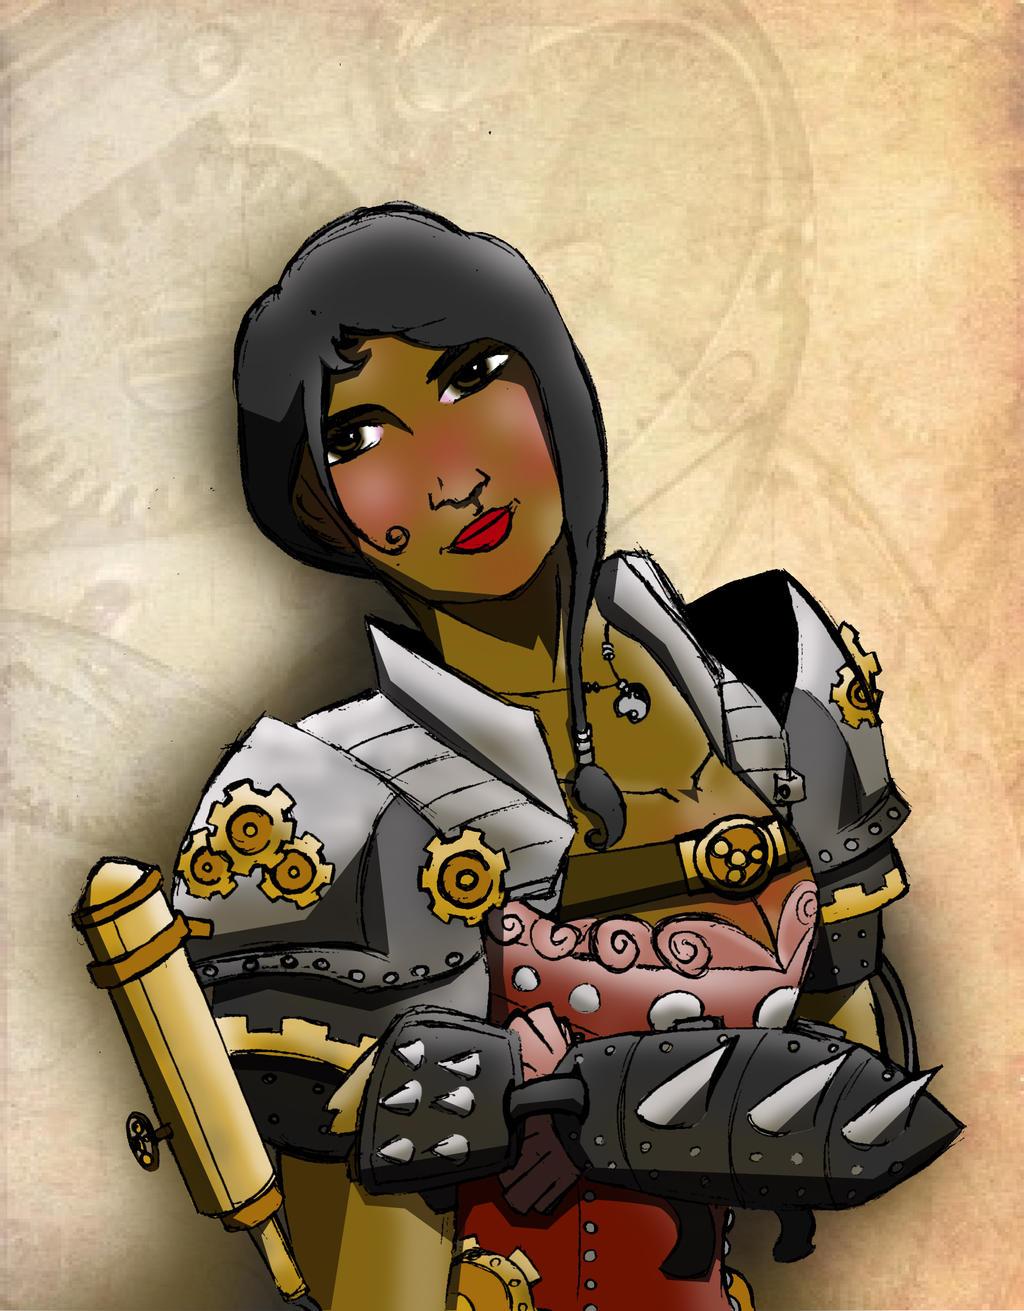 Steampunk Girl copy by Siphen0